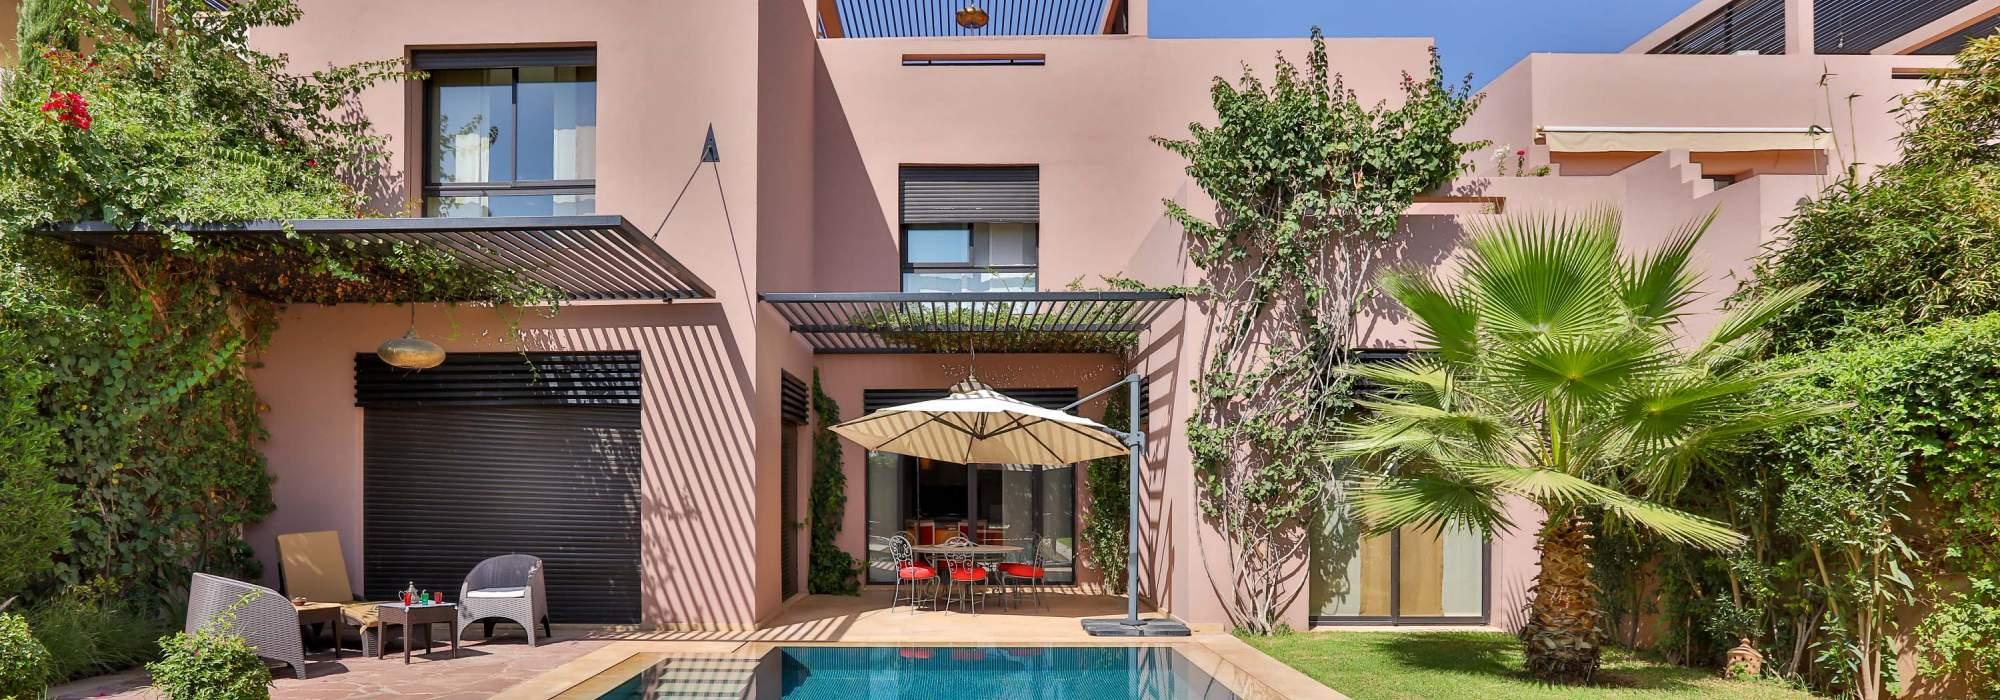 villa golfique a vendre marrakech